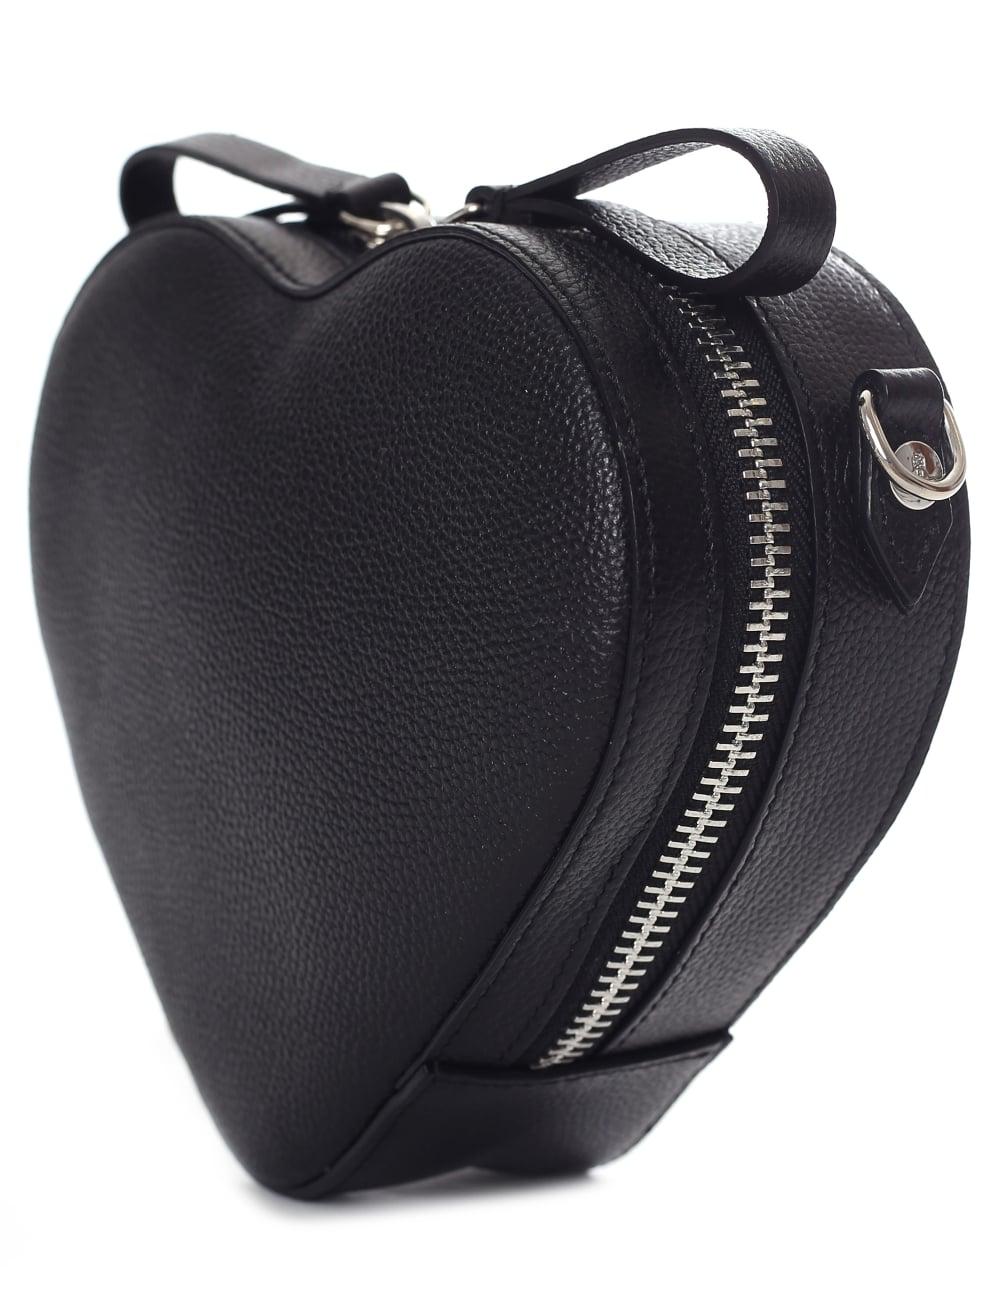 Vivienne Westwood Women s Johanna Heart Crossbody Bag Black 2f9451cd411b7